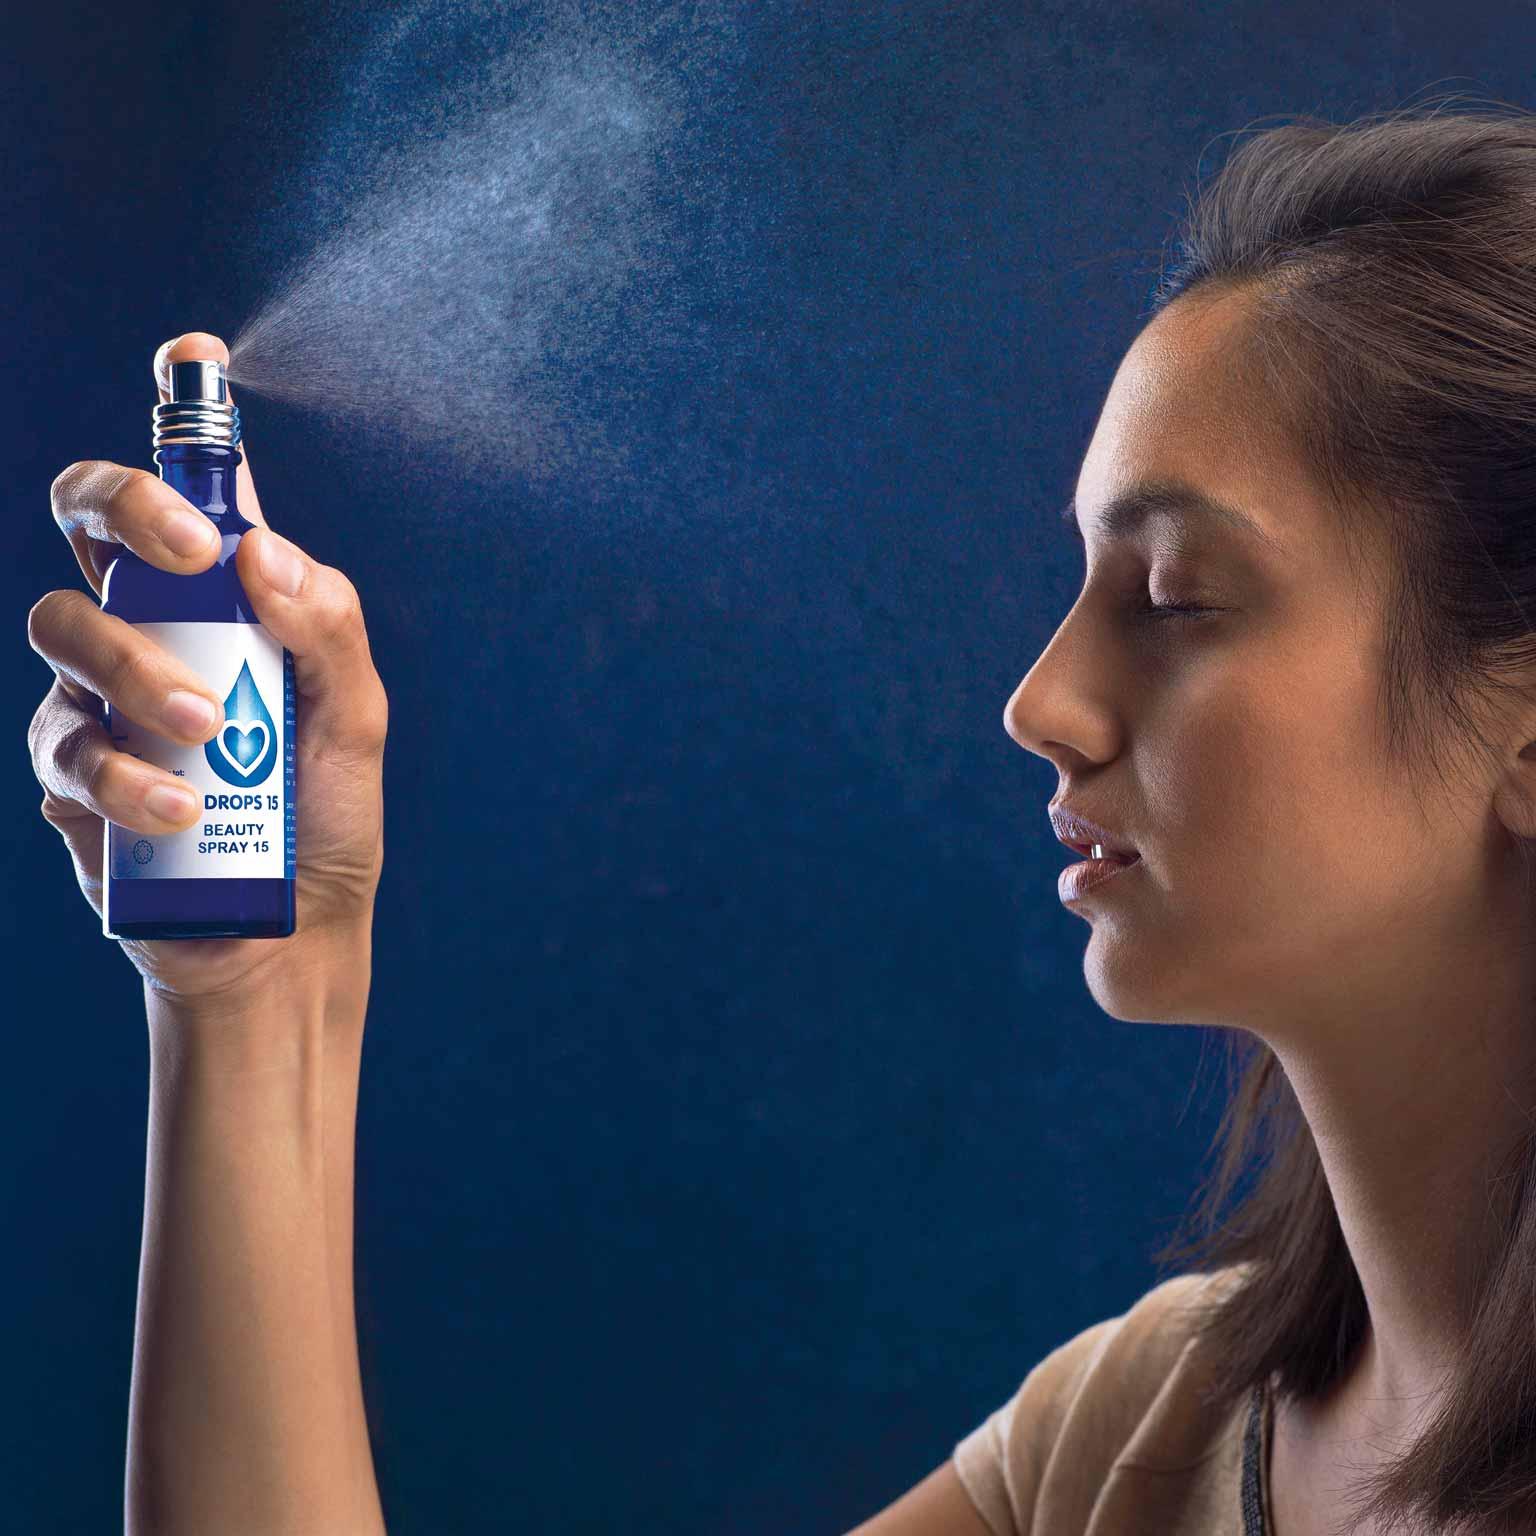 BEAUTY-SPRAY-anti-aging-huid-en-gewrichten-in-gebruik